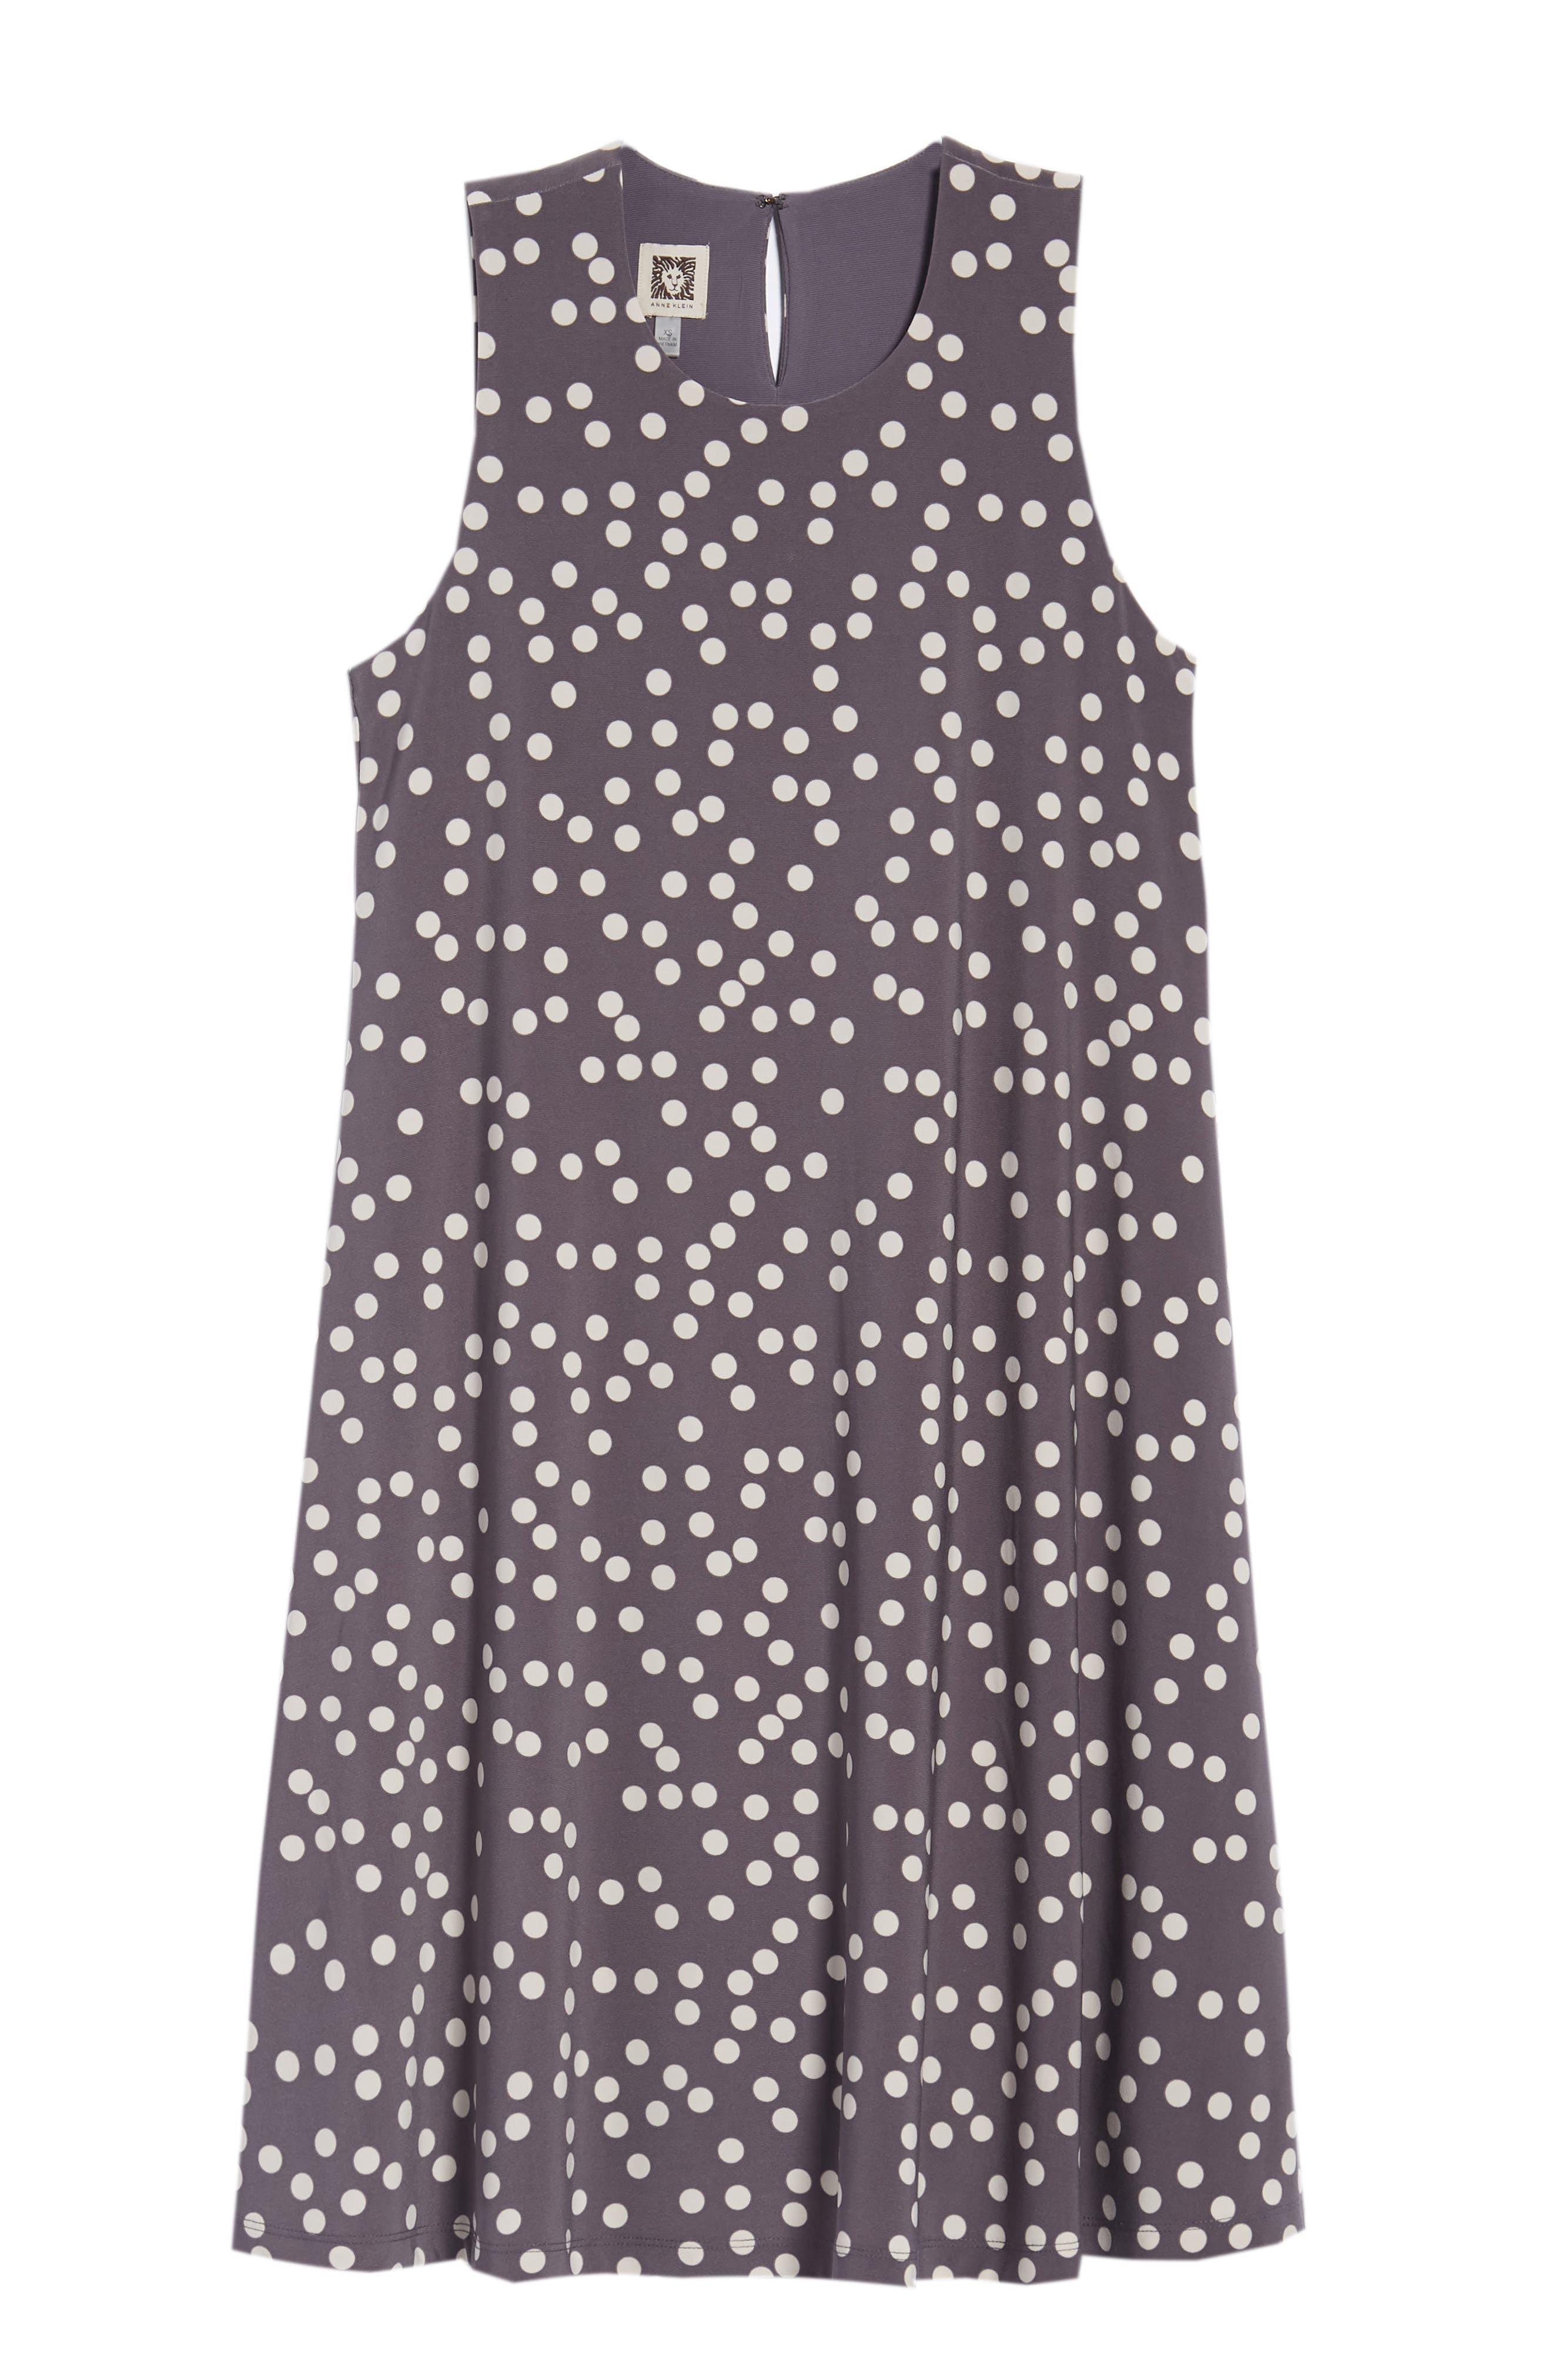 Dot Print Swing Dress,                             Alternate thumbnail 7, color,                             Nantucket Grey/ Oyster Shell